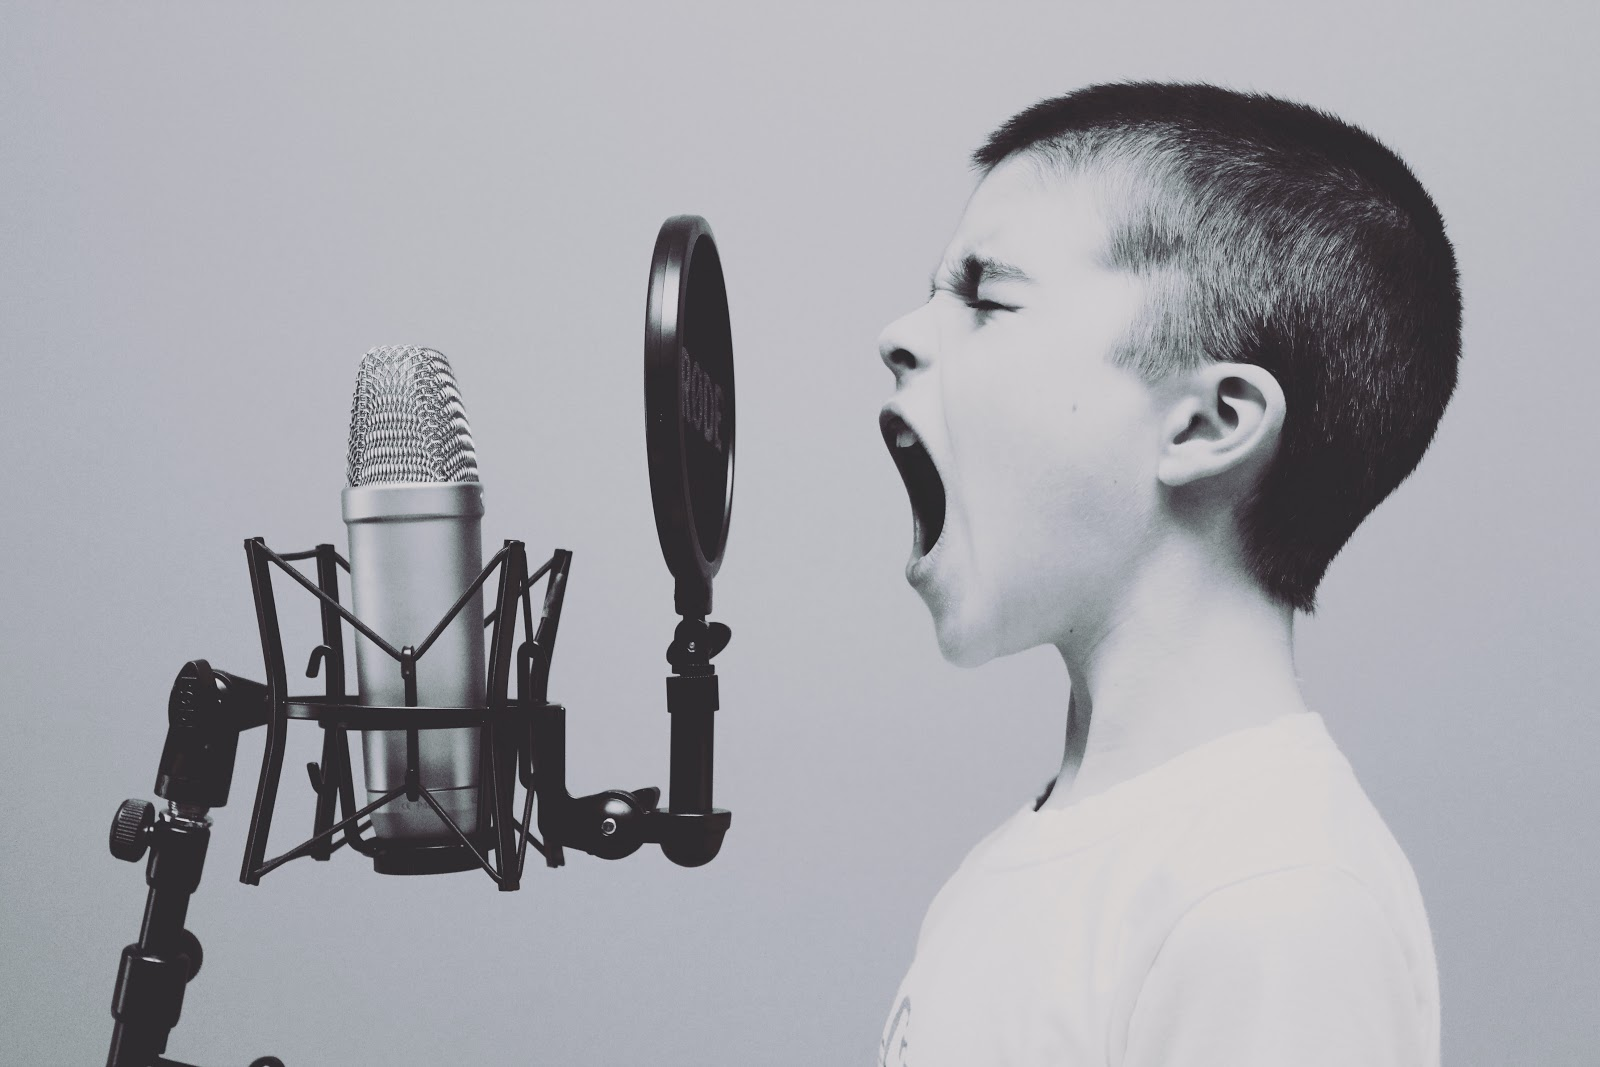 boy shouting, escalation processes for urgent matters